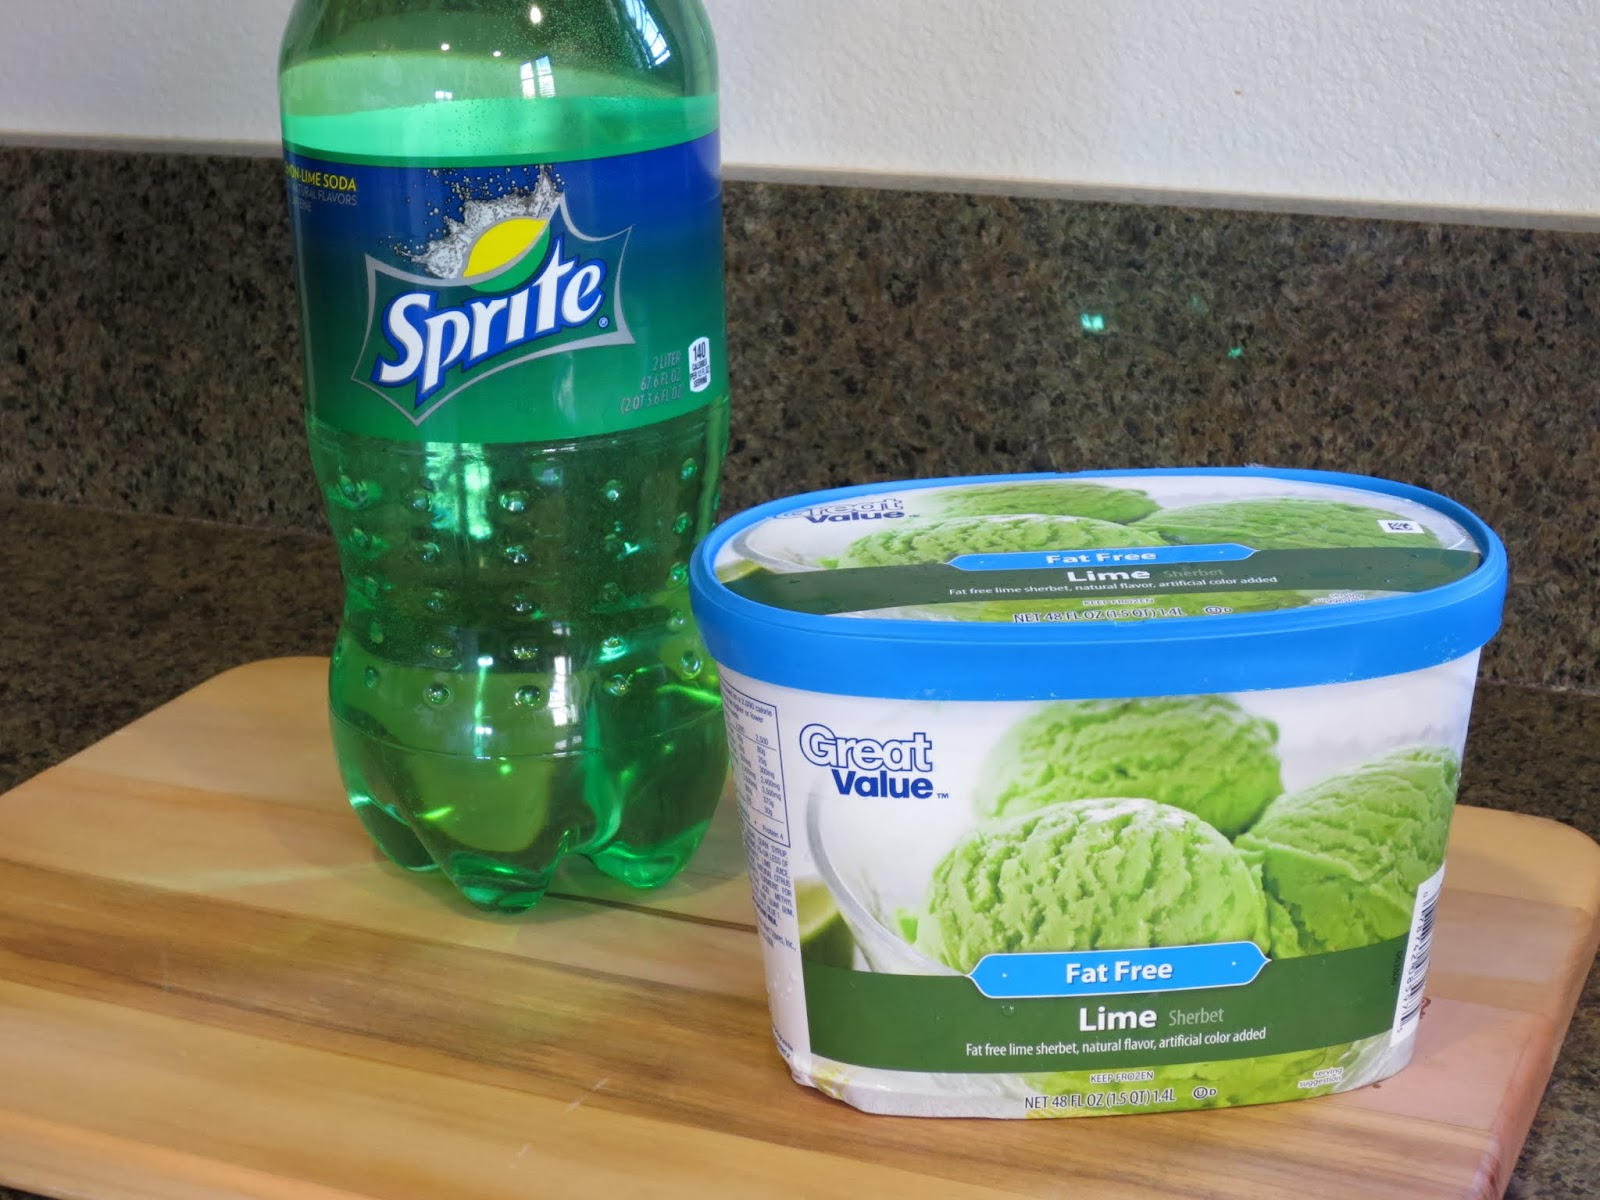 St Patrick's Day - Lemon Lime soda and Lime Sherbet Float